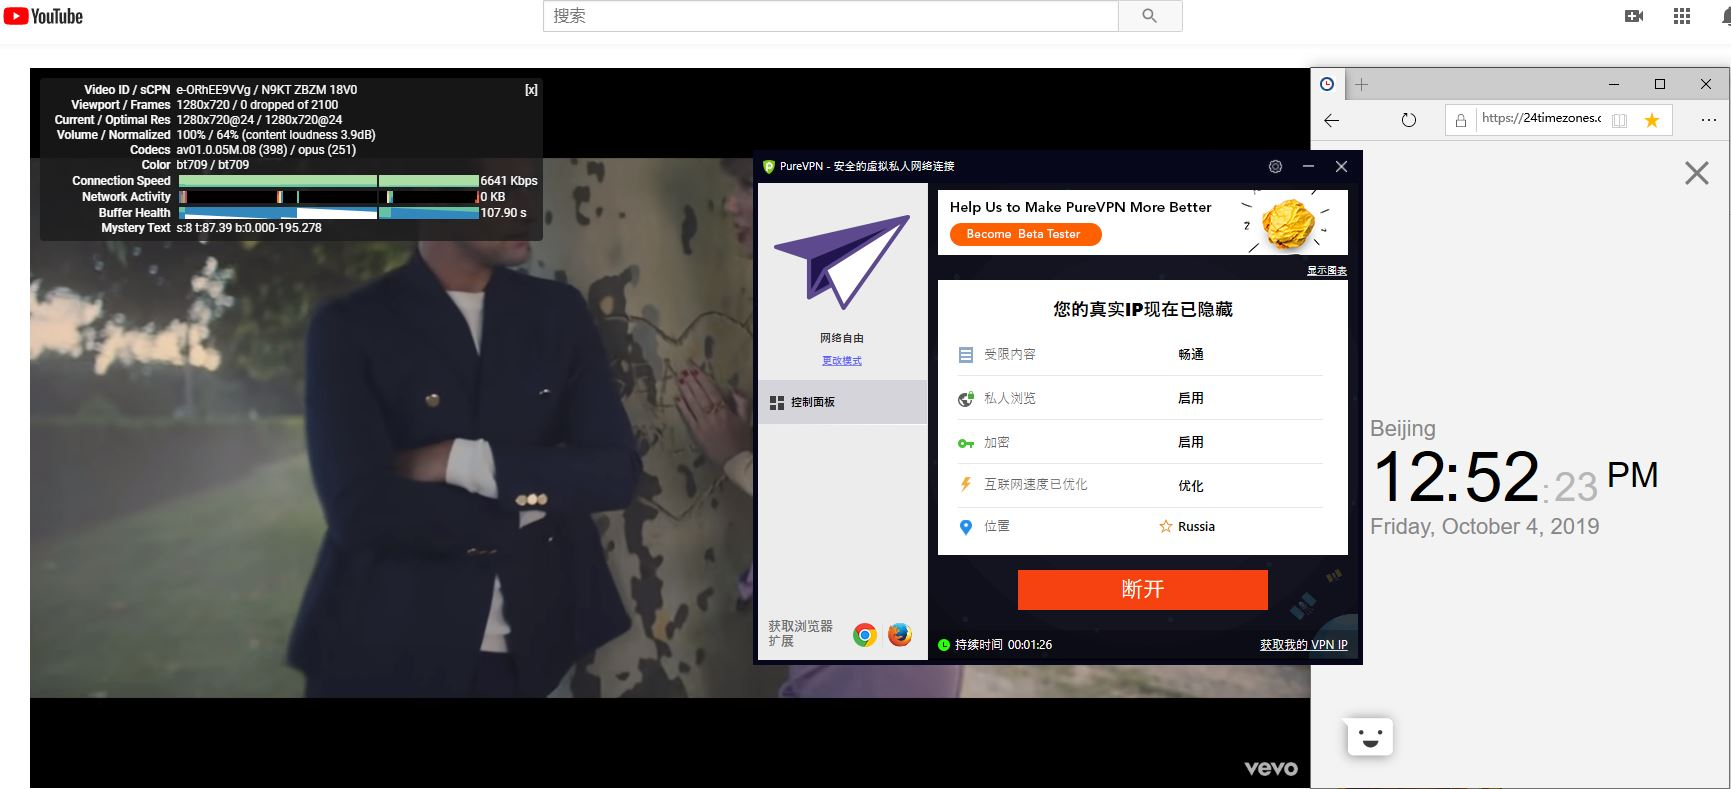 PureVPN Windows Russia 服务器 中国VPN翻墙 科学上网 YouTube测速-20191004